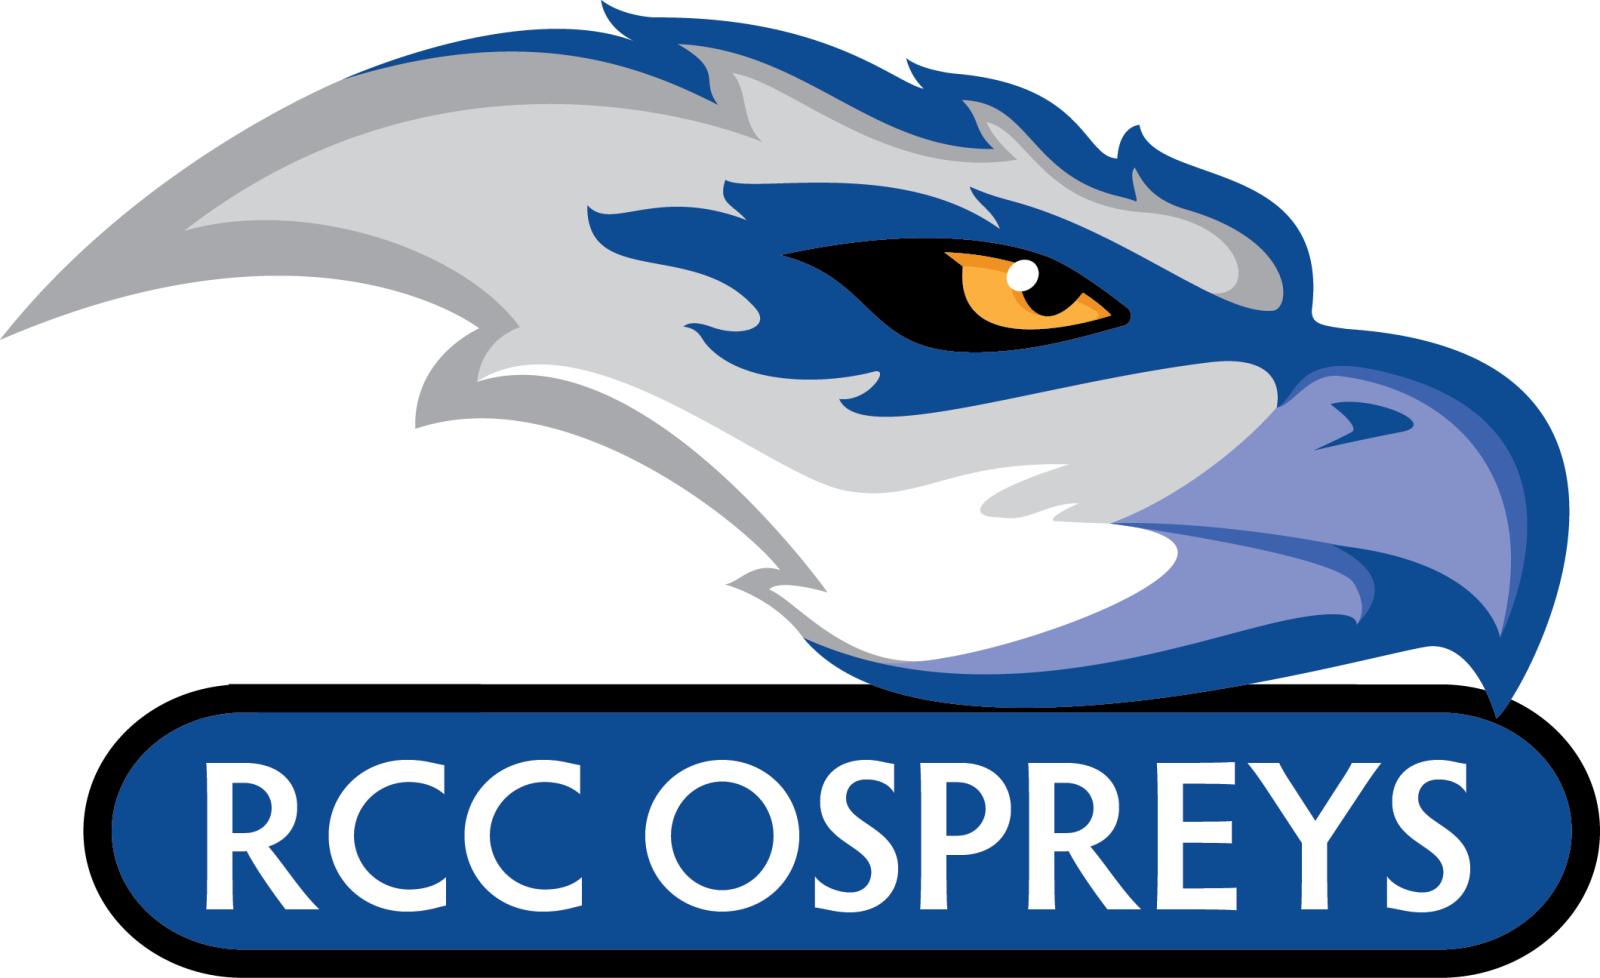 RCC Ospreys